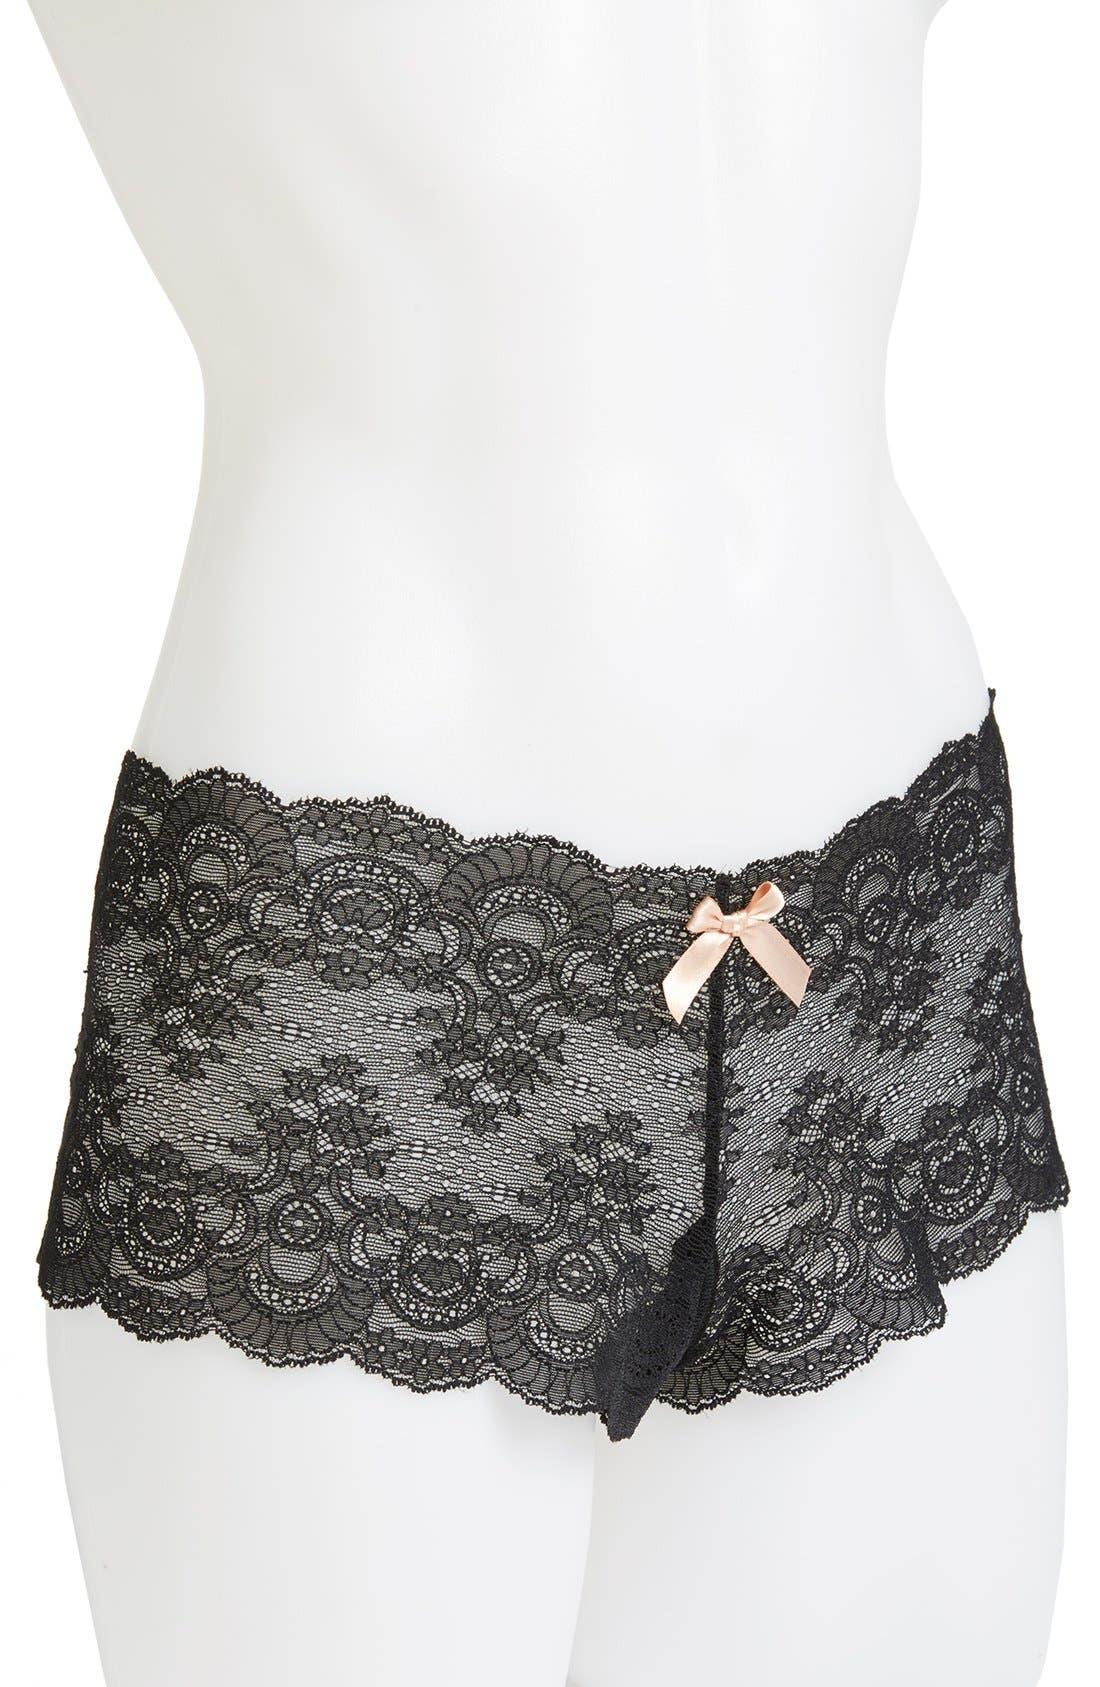 HANKY PANKY,                             Open Gusset Panties,                             Alternate thumbnail 2, color,                             BLACK